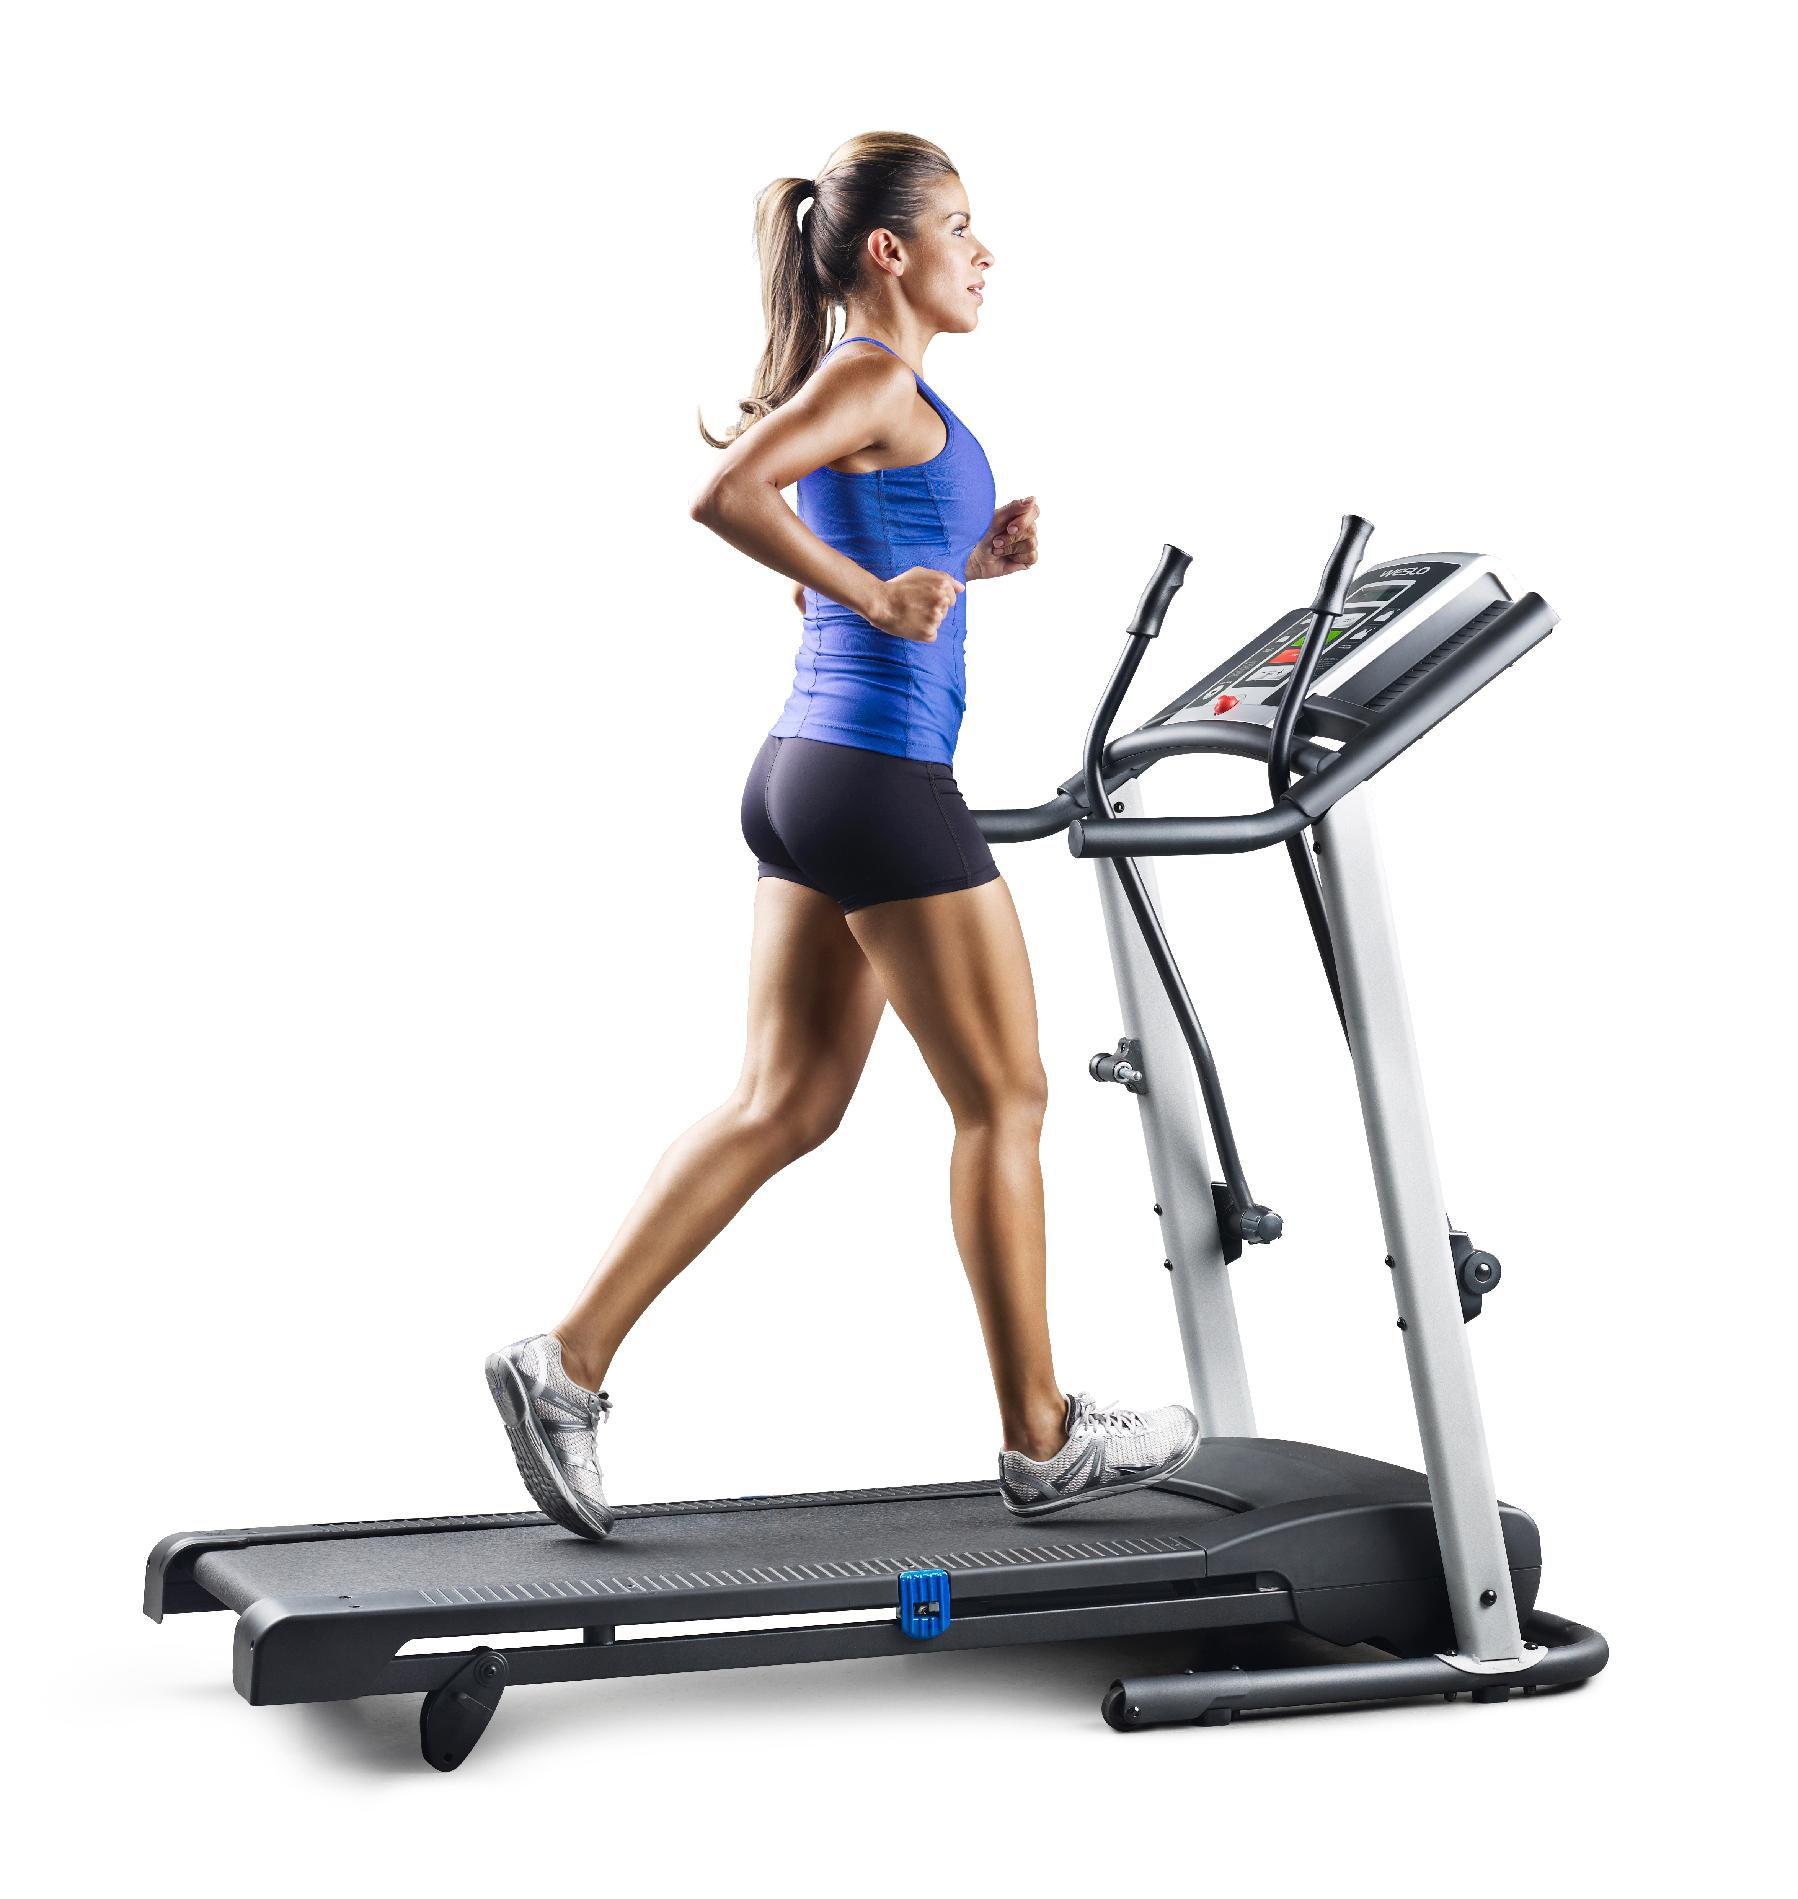 Weslo 5.2 Crosswalk Treadmill